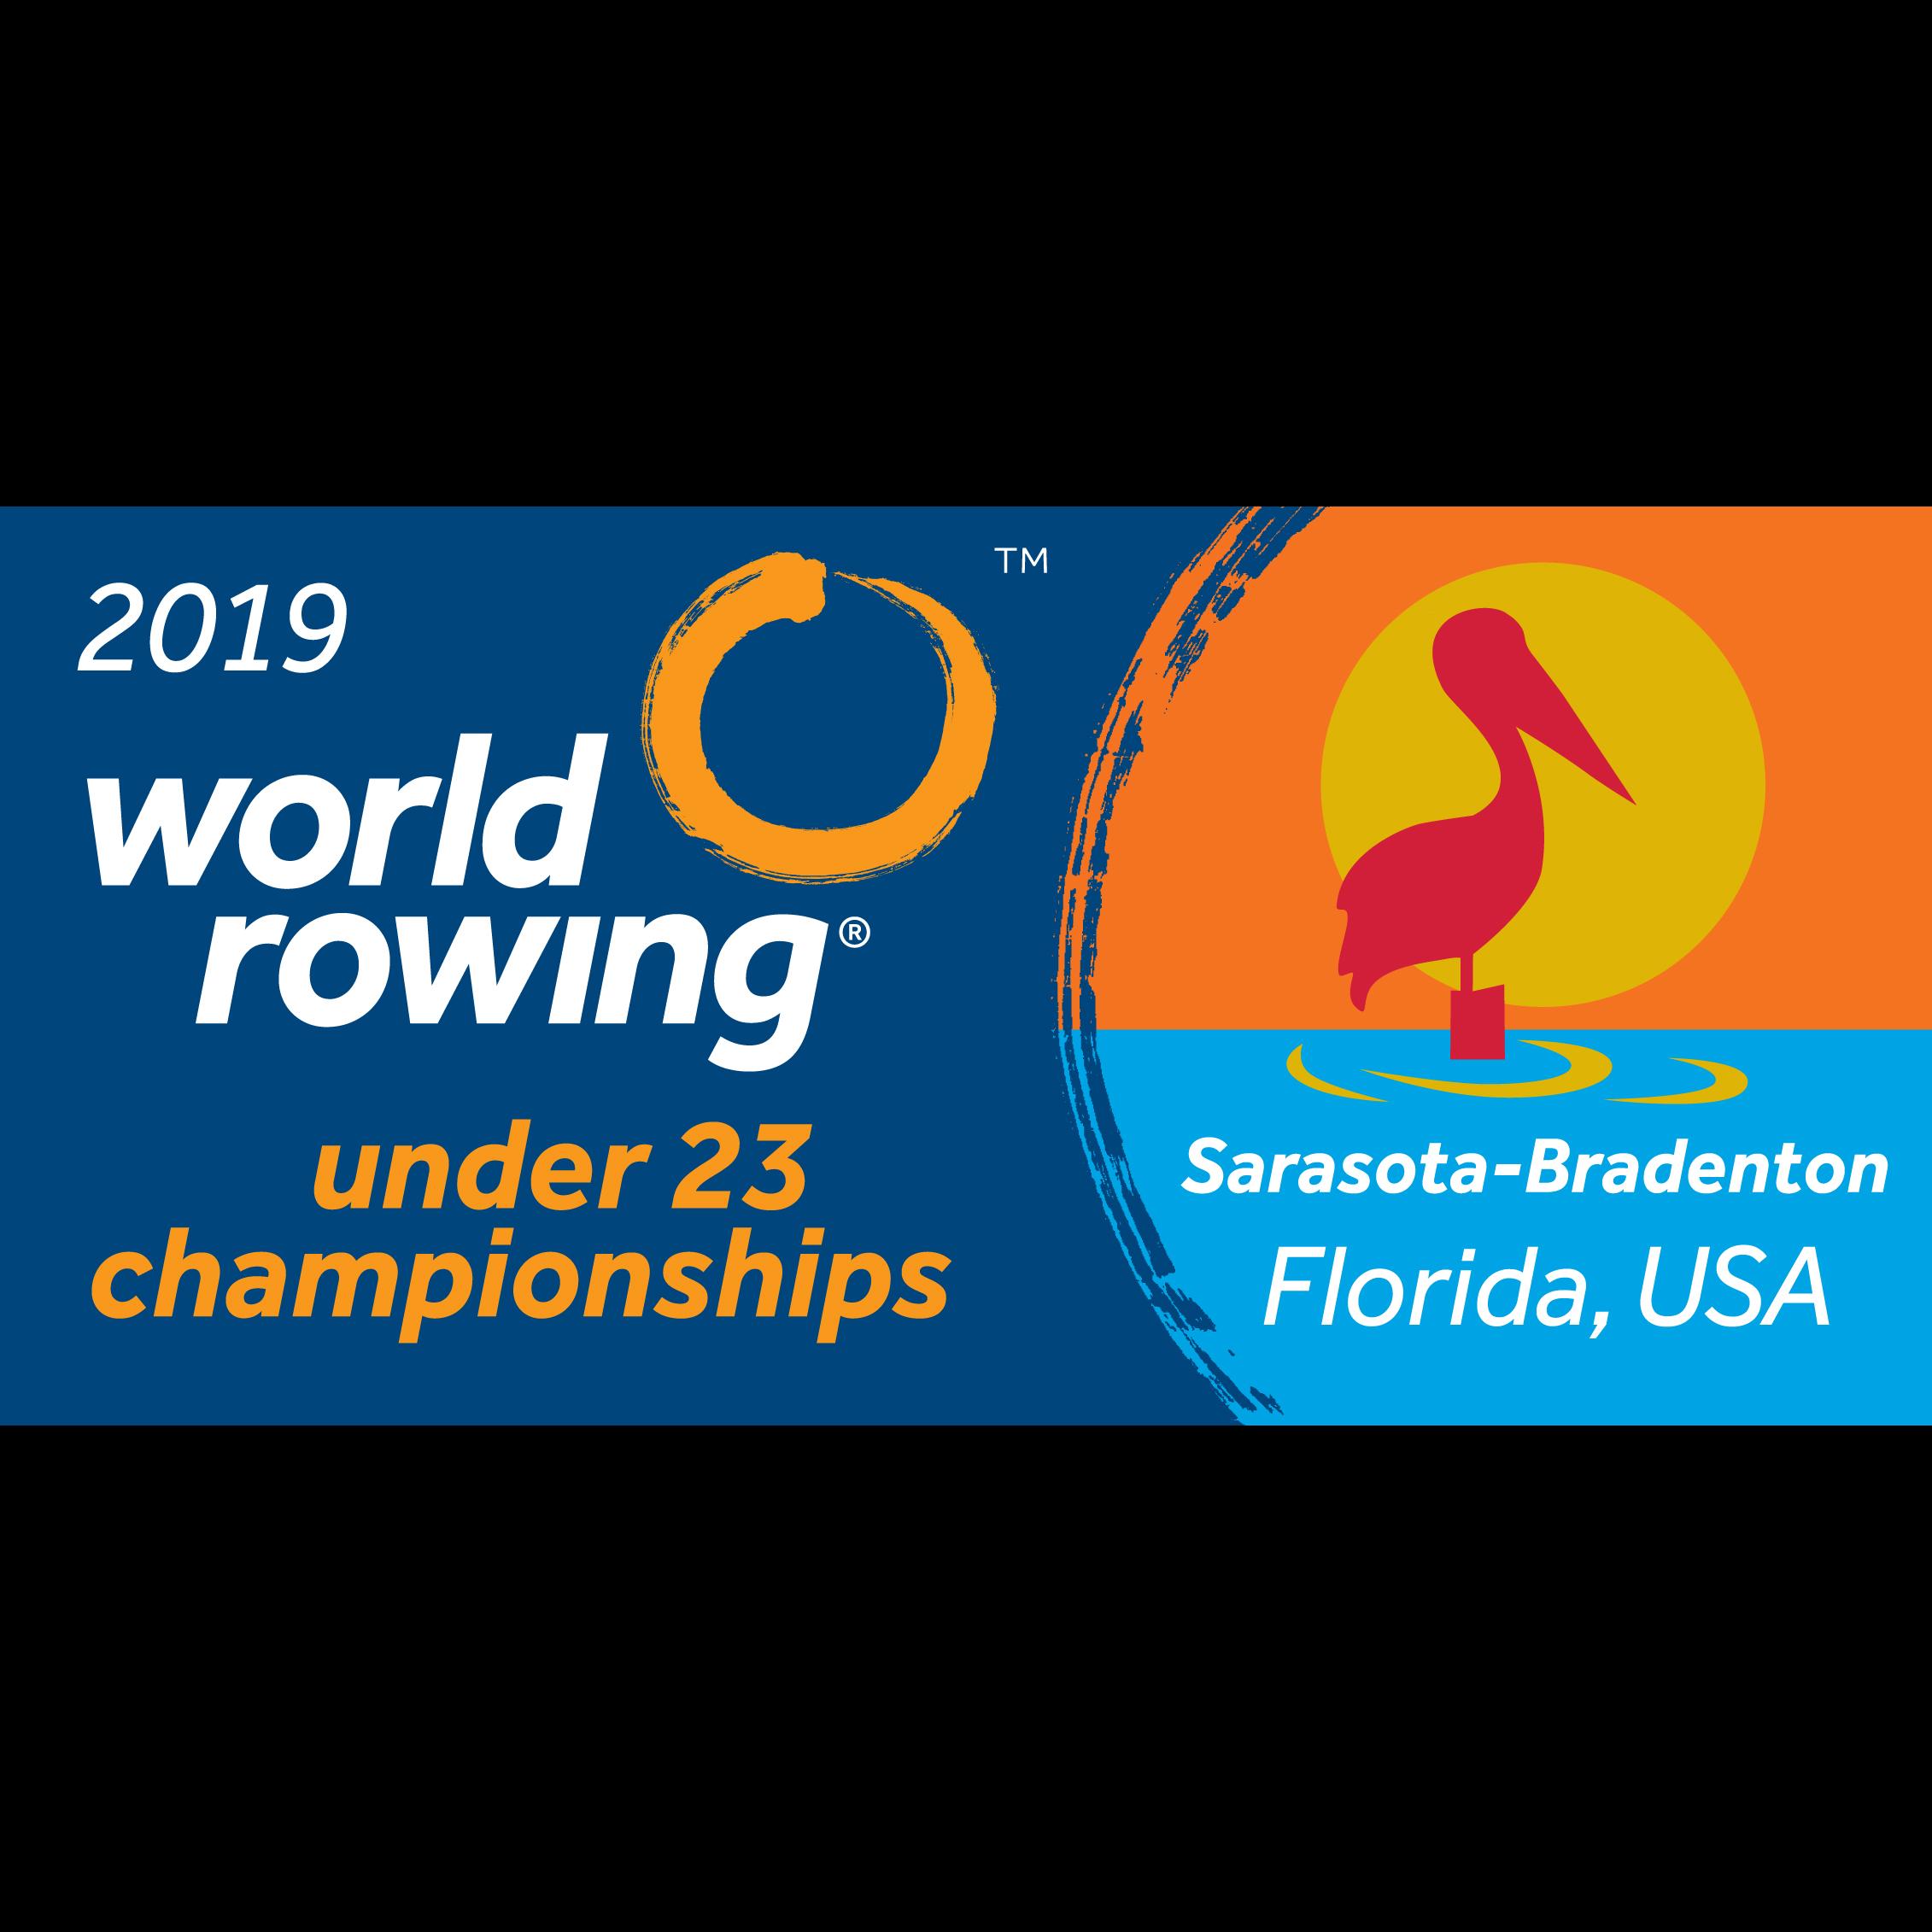 2019 World Rowing U23 Championships